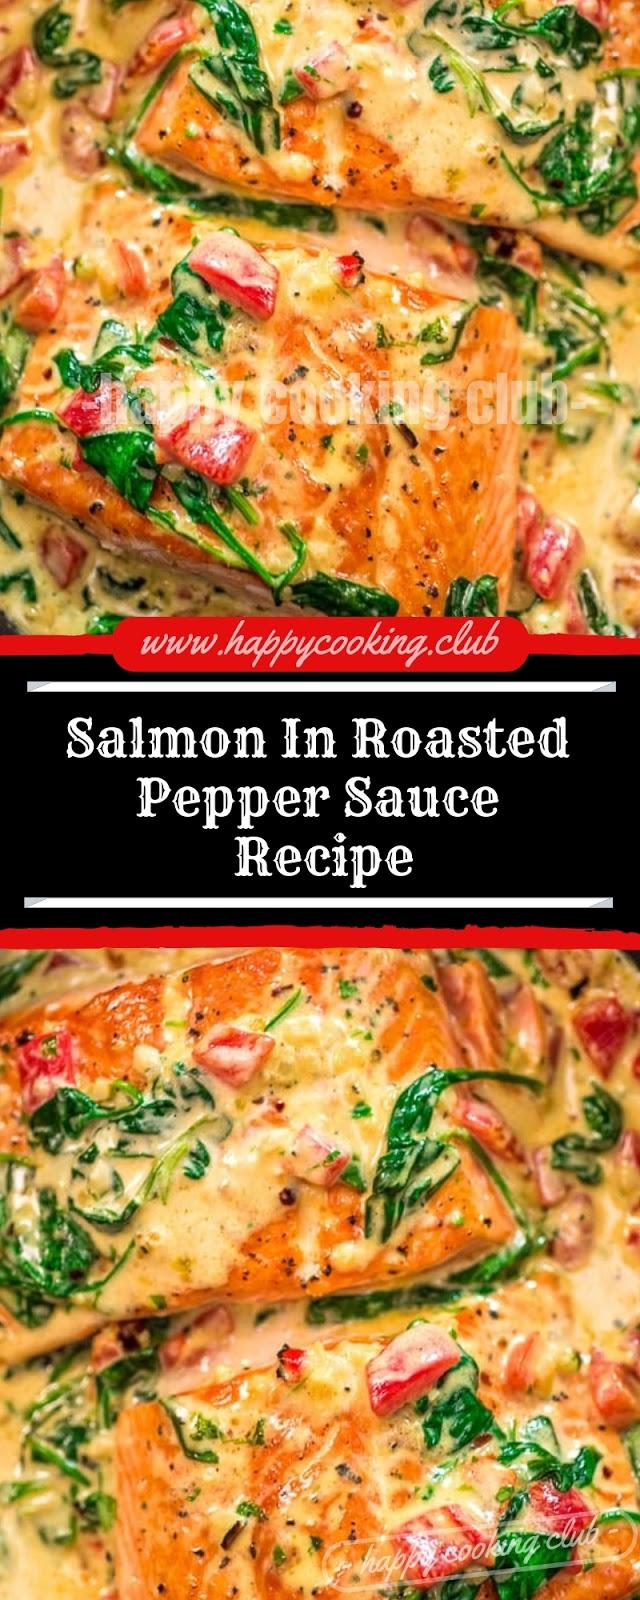 Salmon In Roasted Pepper Sauce Recipe